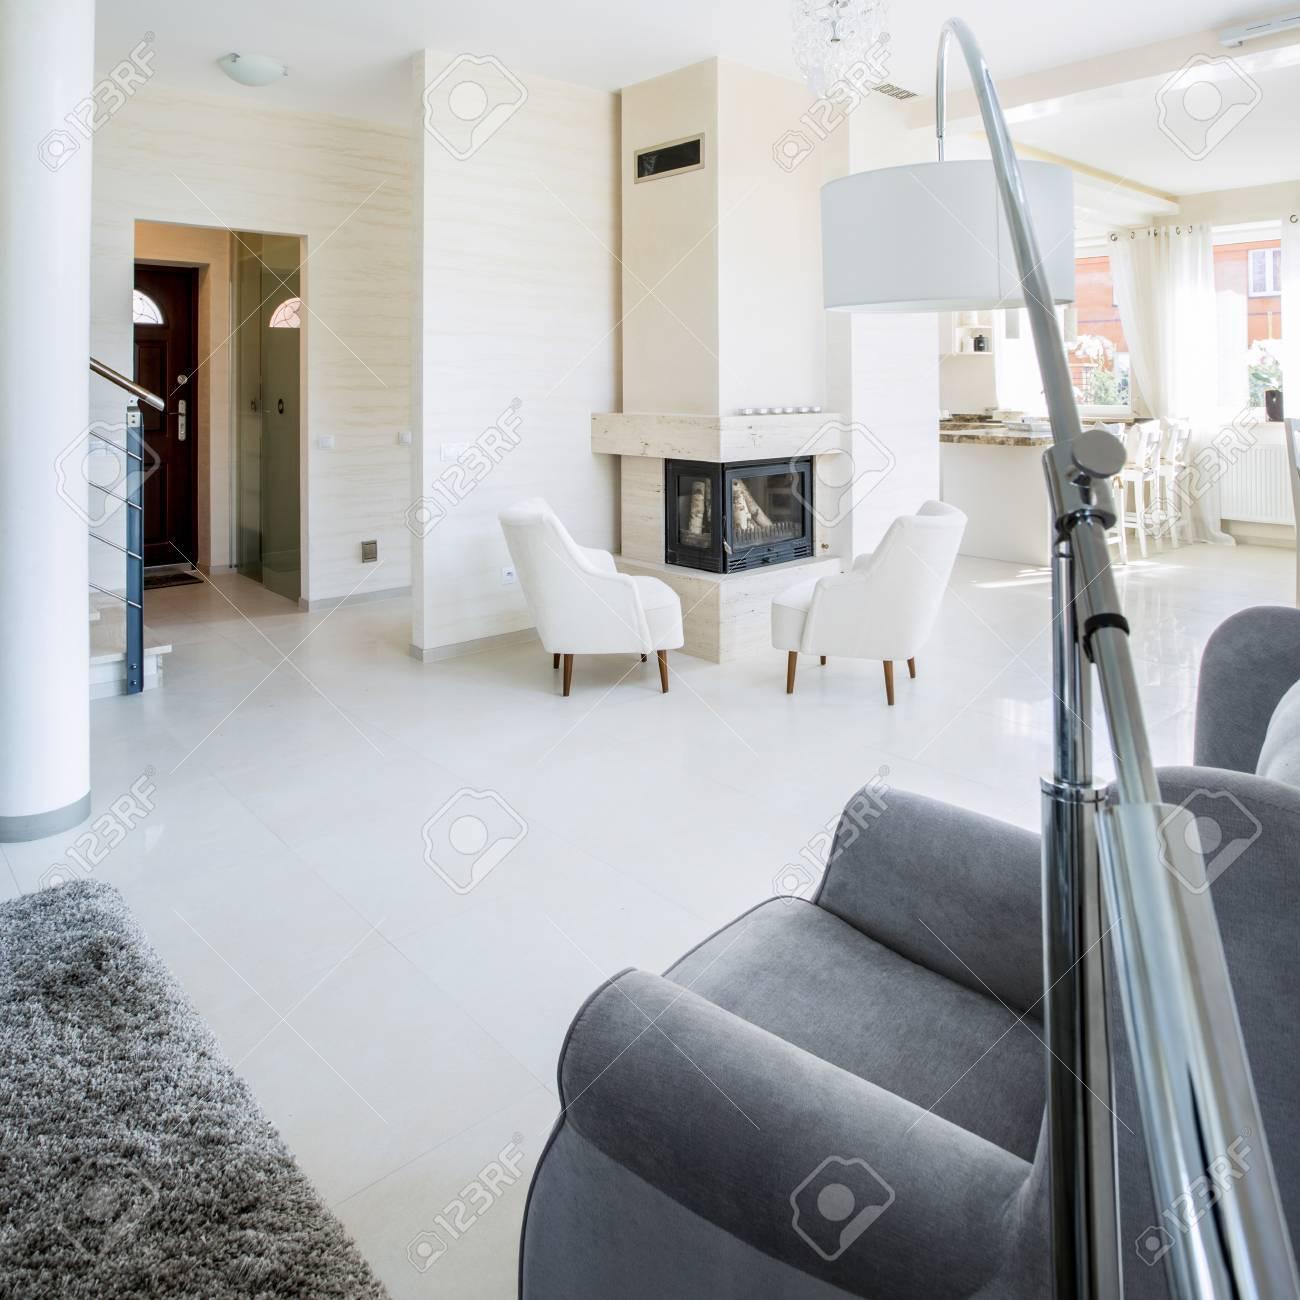 https://previews.123rf.com/images/bialasiewicz/bialasiewicz1605/bialasiewicz160501295/57019877-foto-von-der-sch%C3%B6nen-interieur-eines-luxus-wohnung.jpg